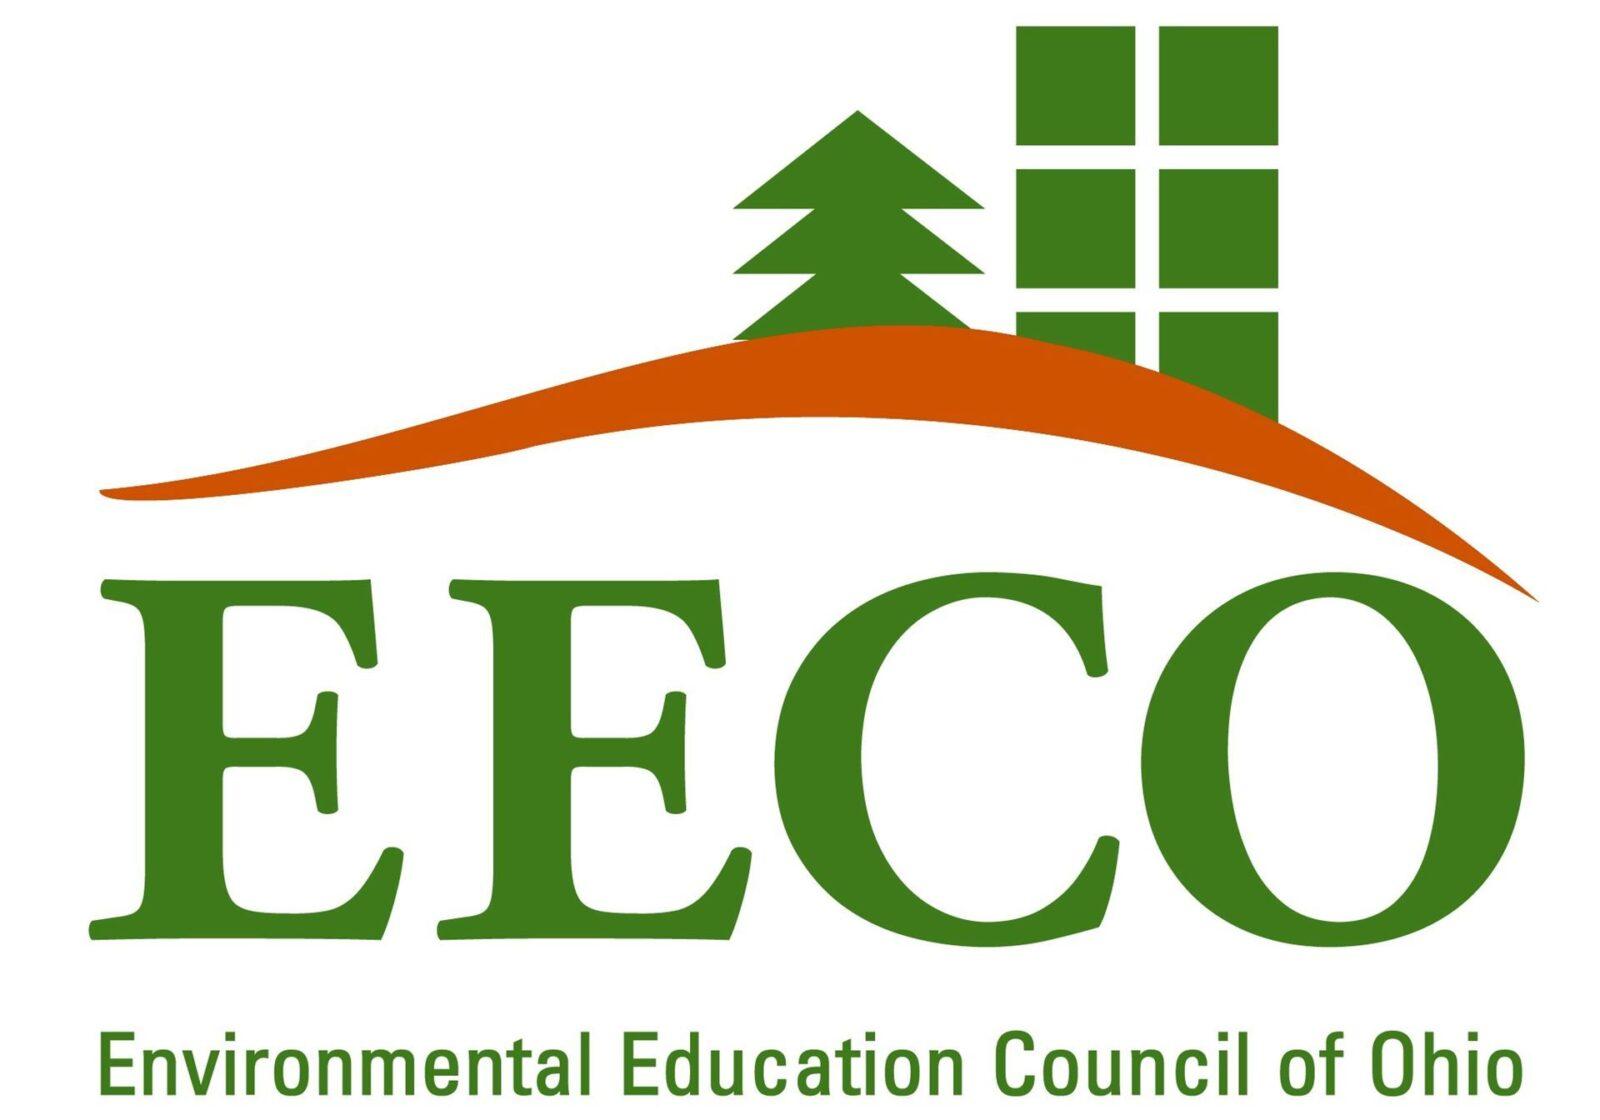 Environmental Education Council of Ohio